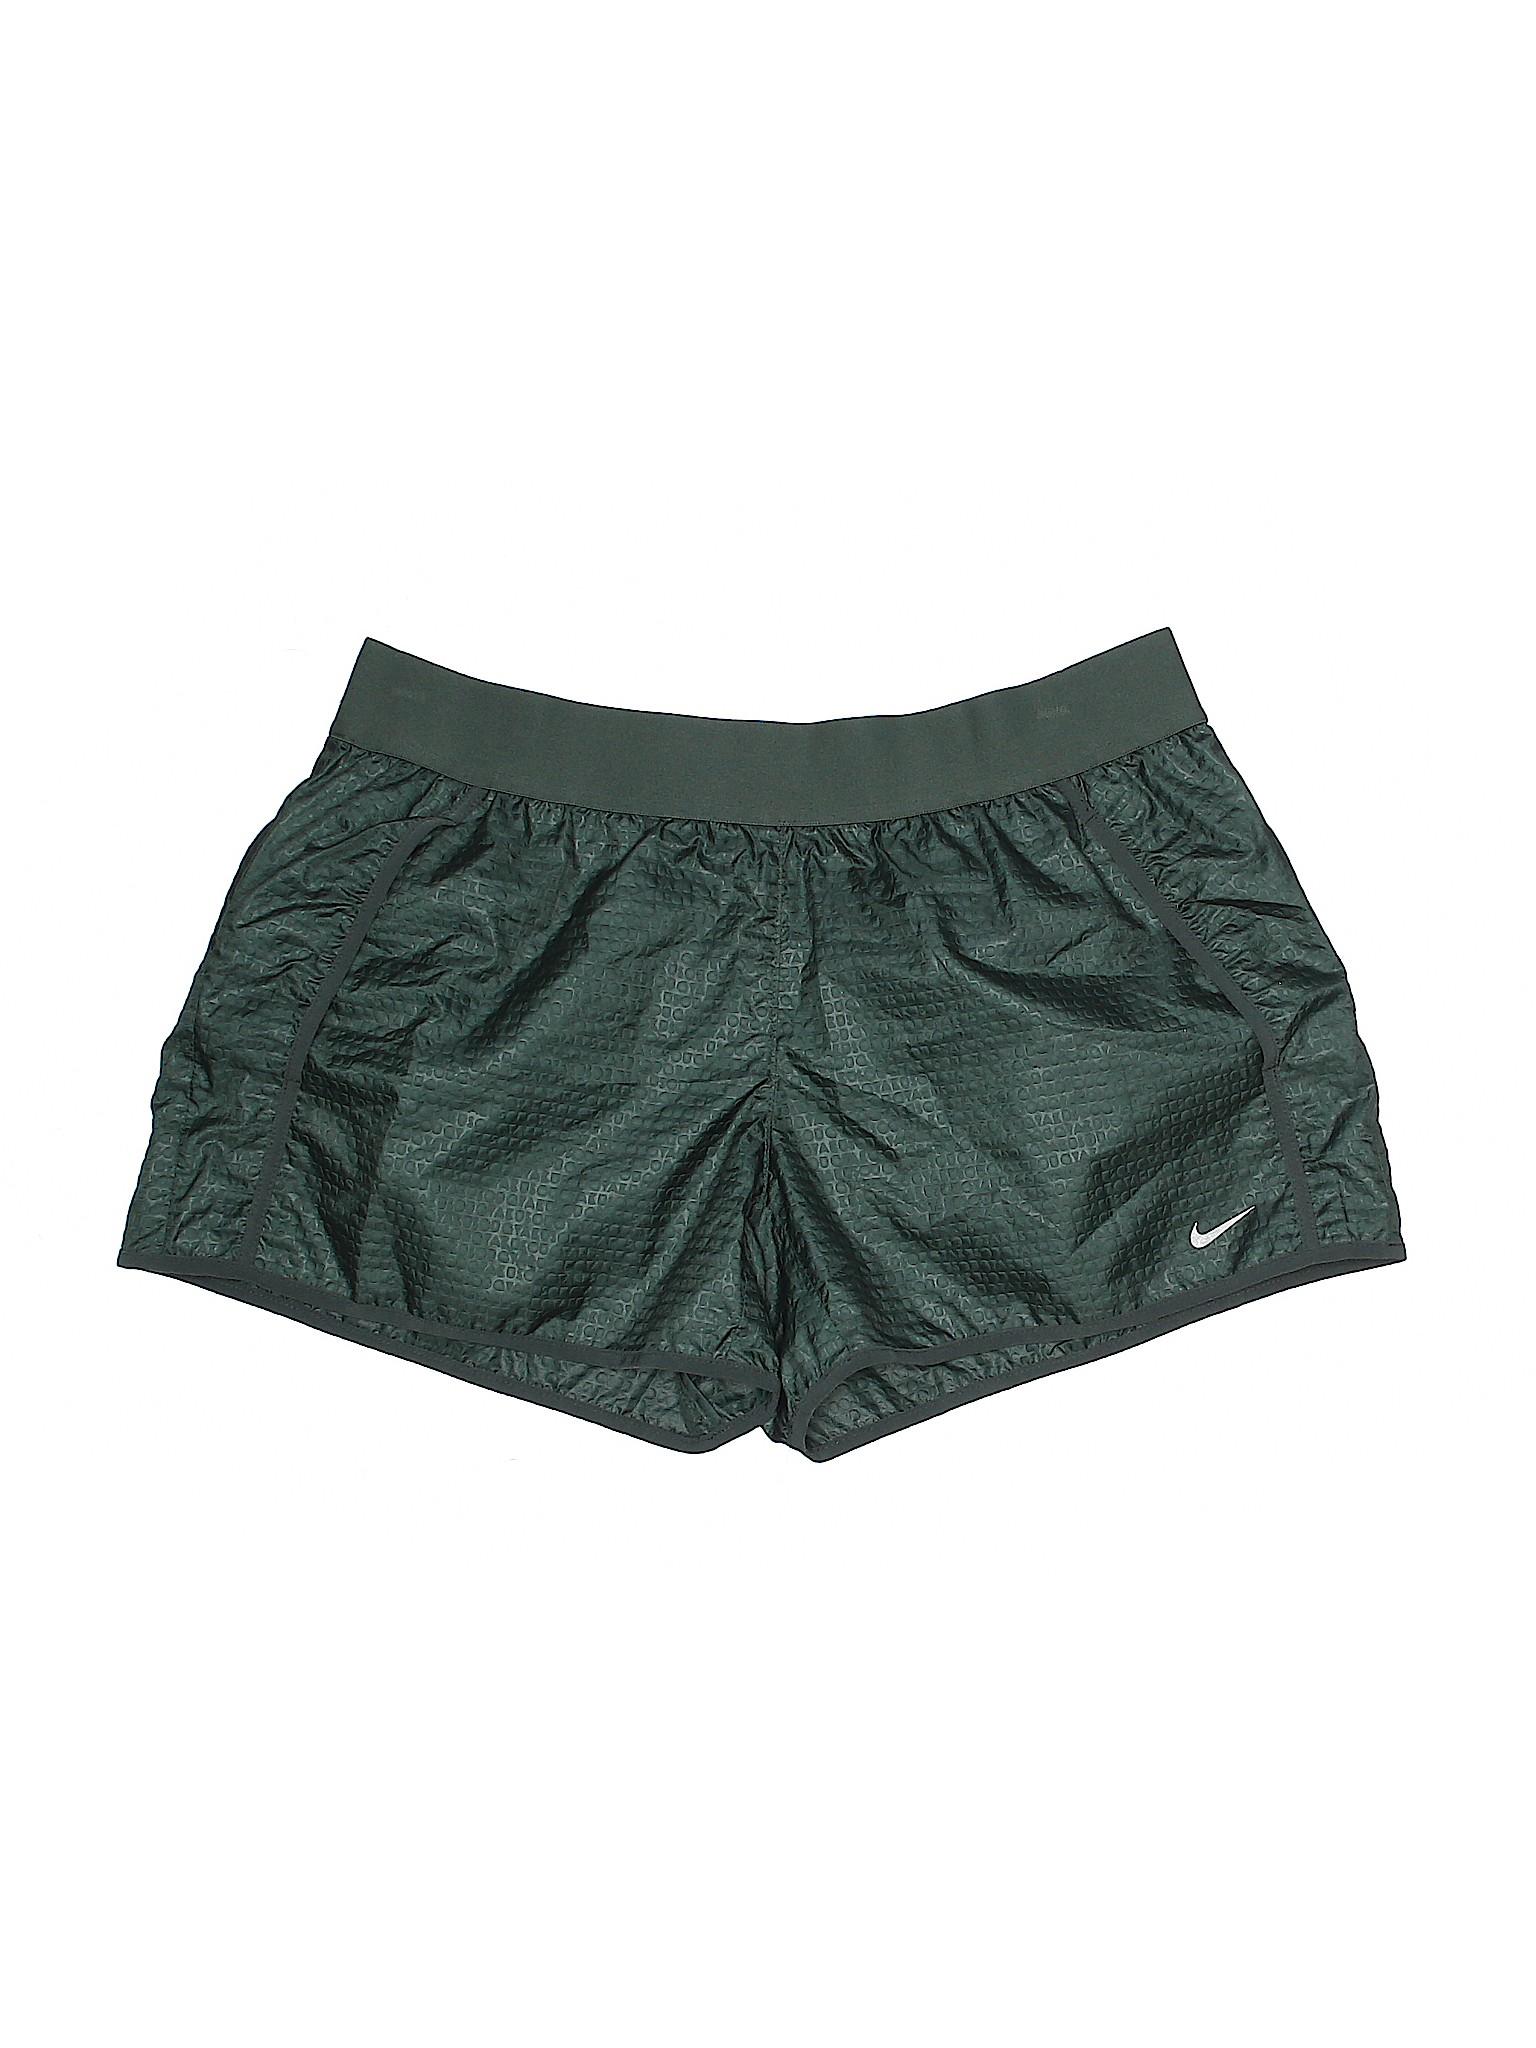 Shorts Leisure Athletic Leisure winter winter Nike qgxxXF5B